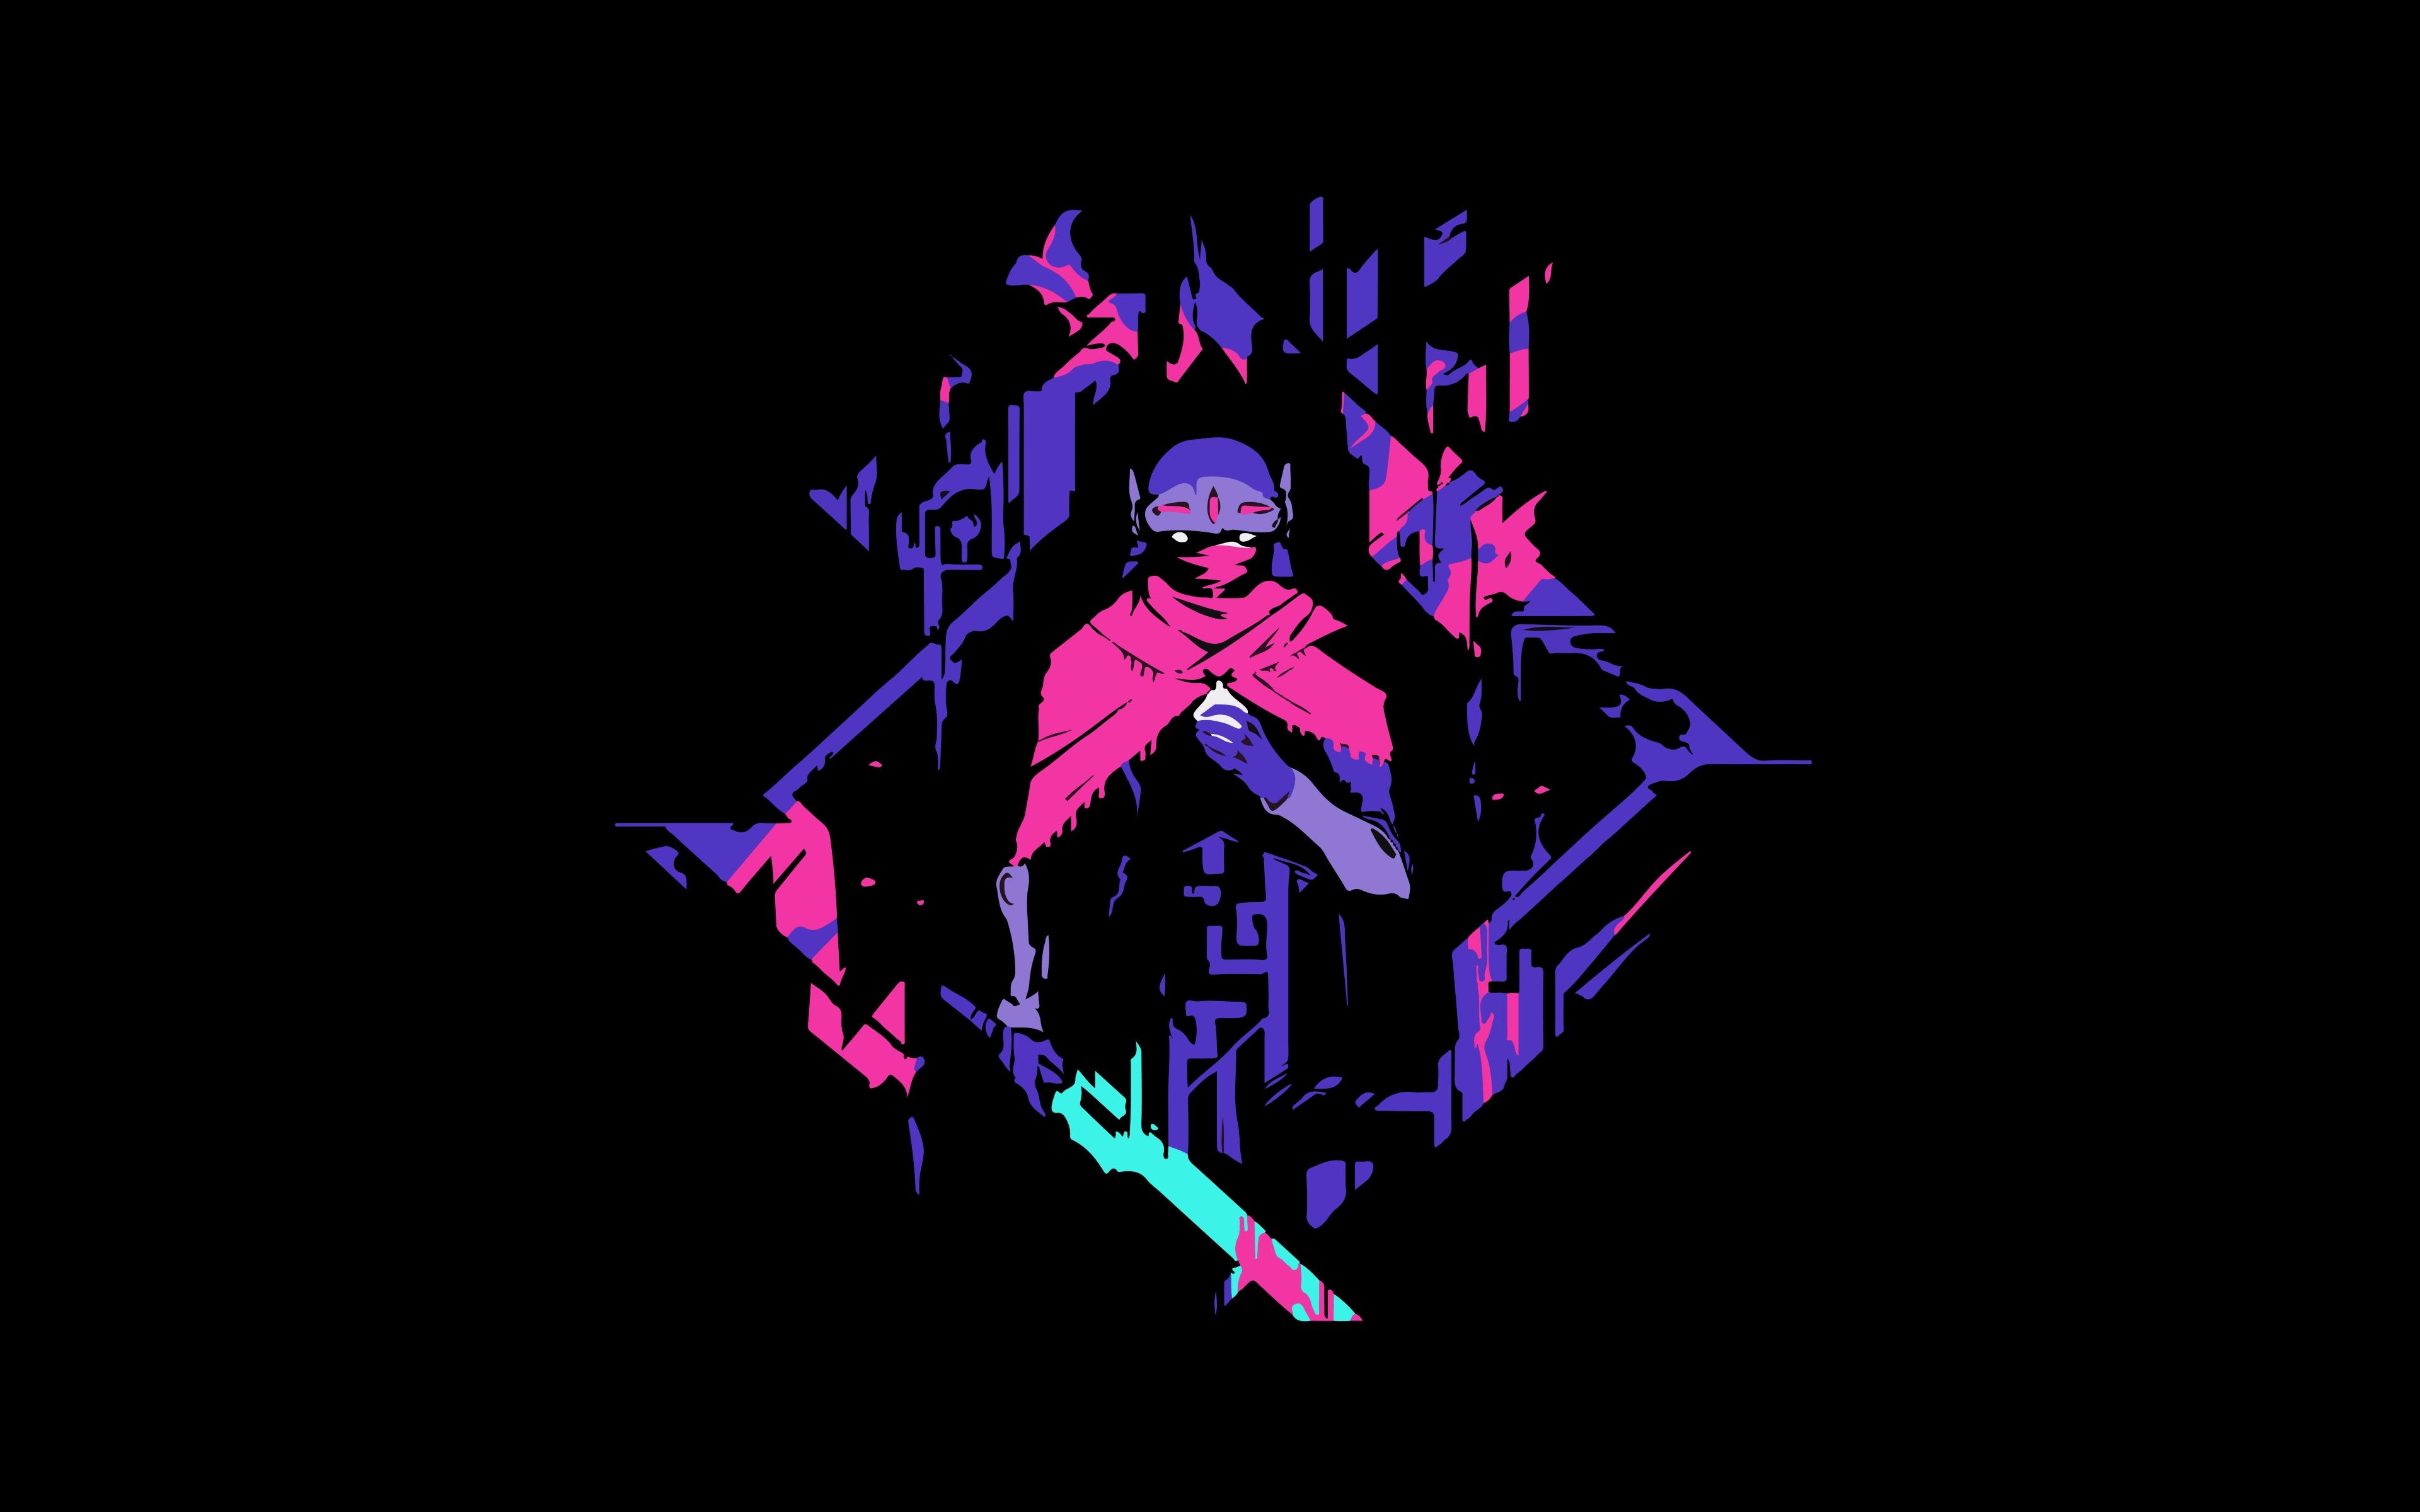 4k gaming wallpaper,graphic design,illustration,purple,magenta,art